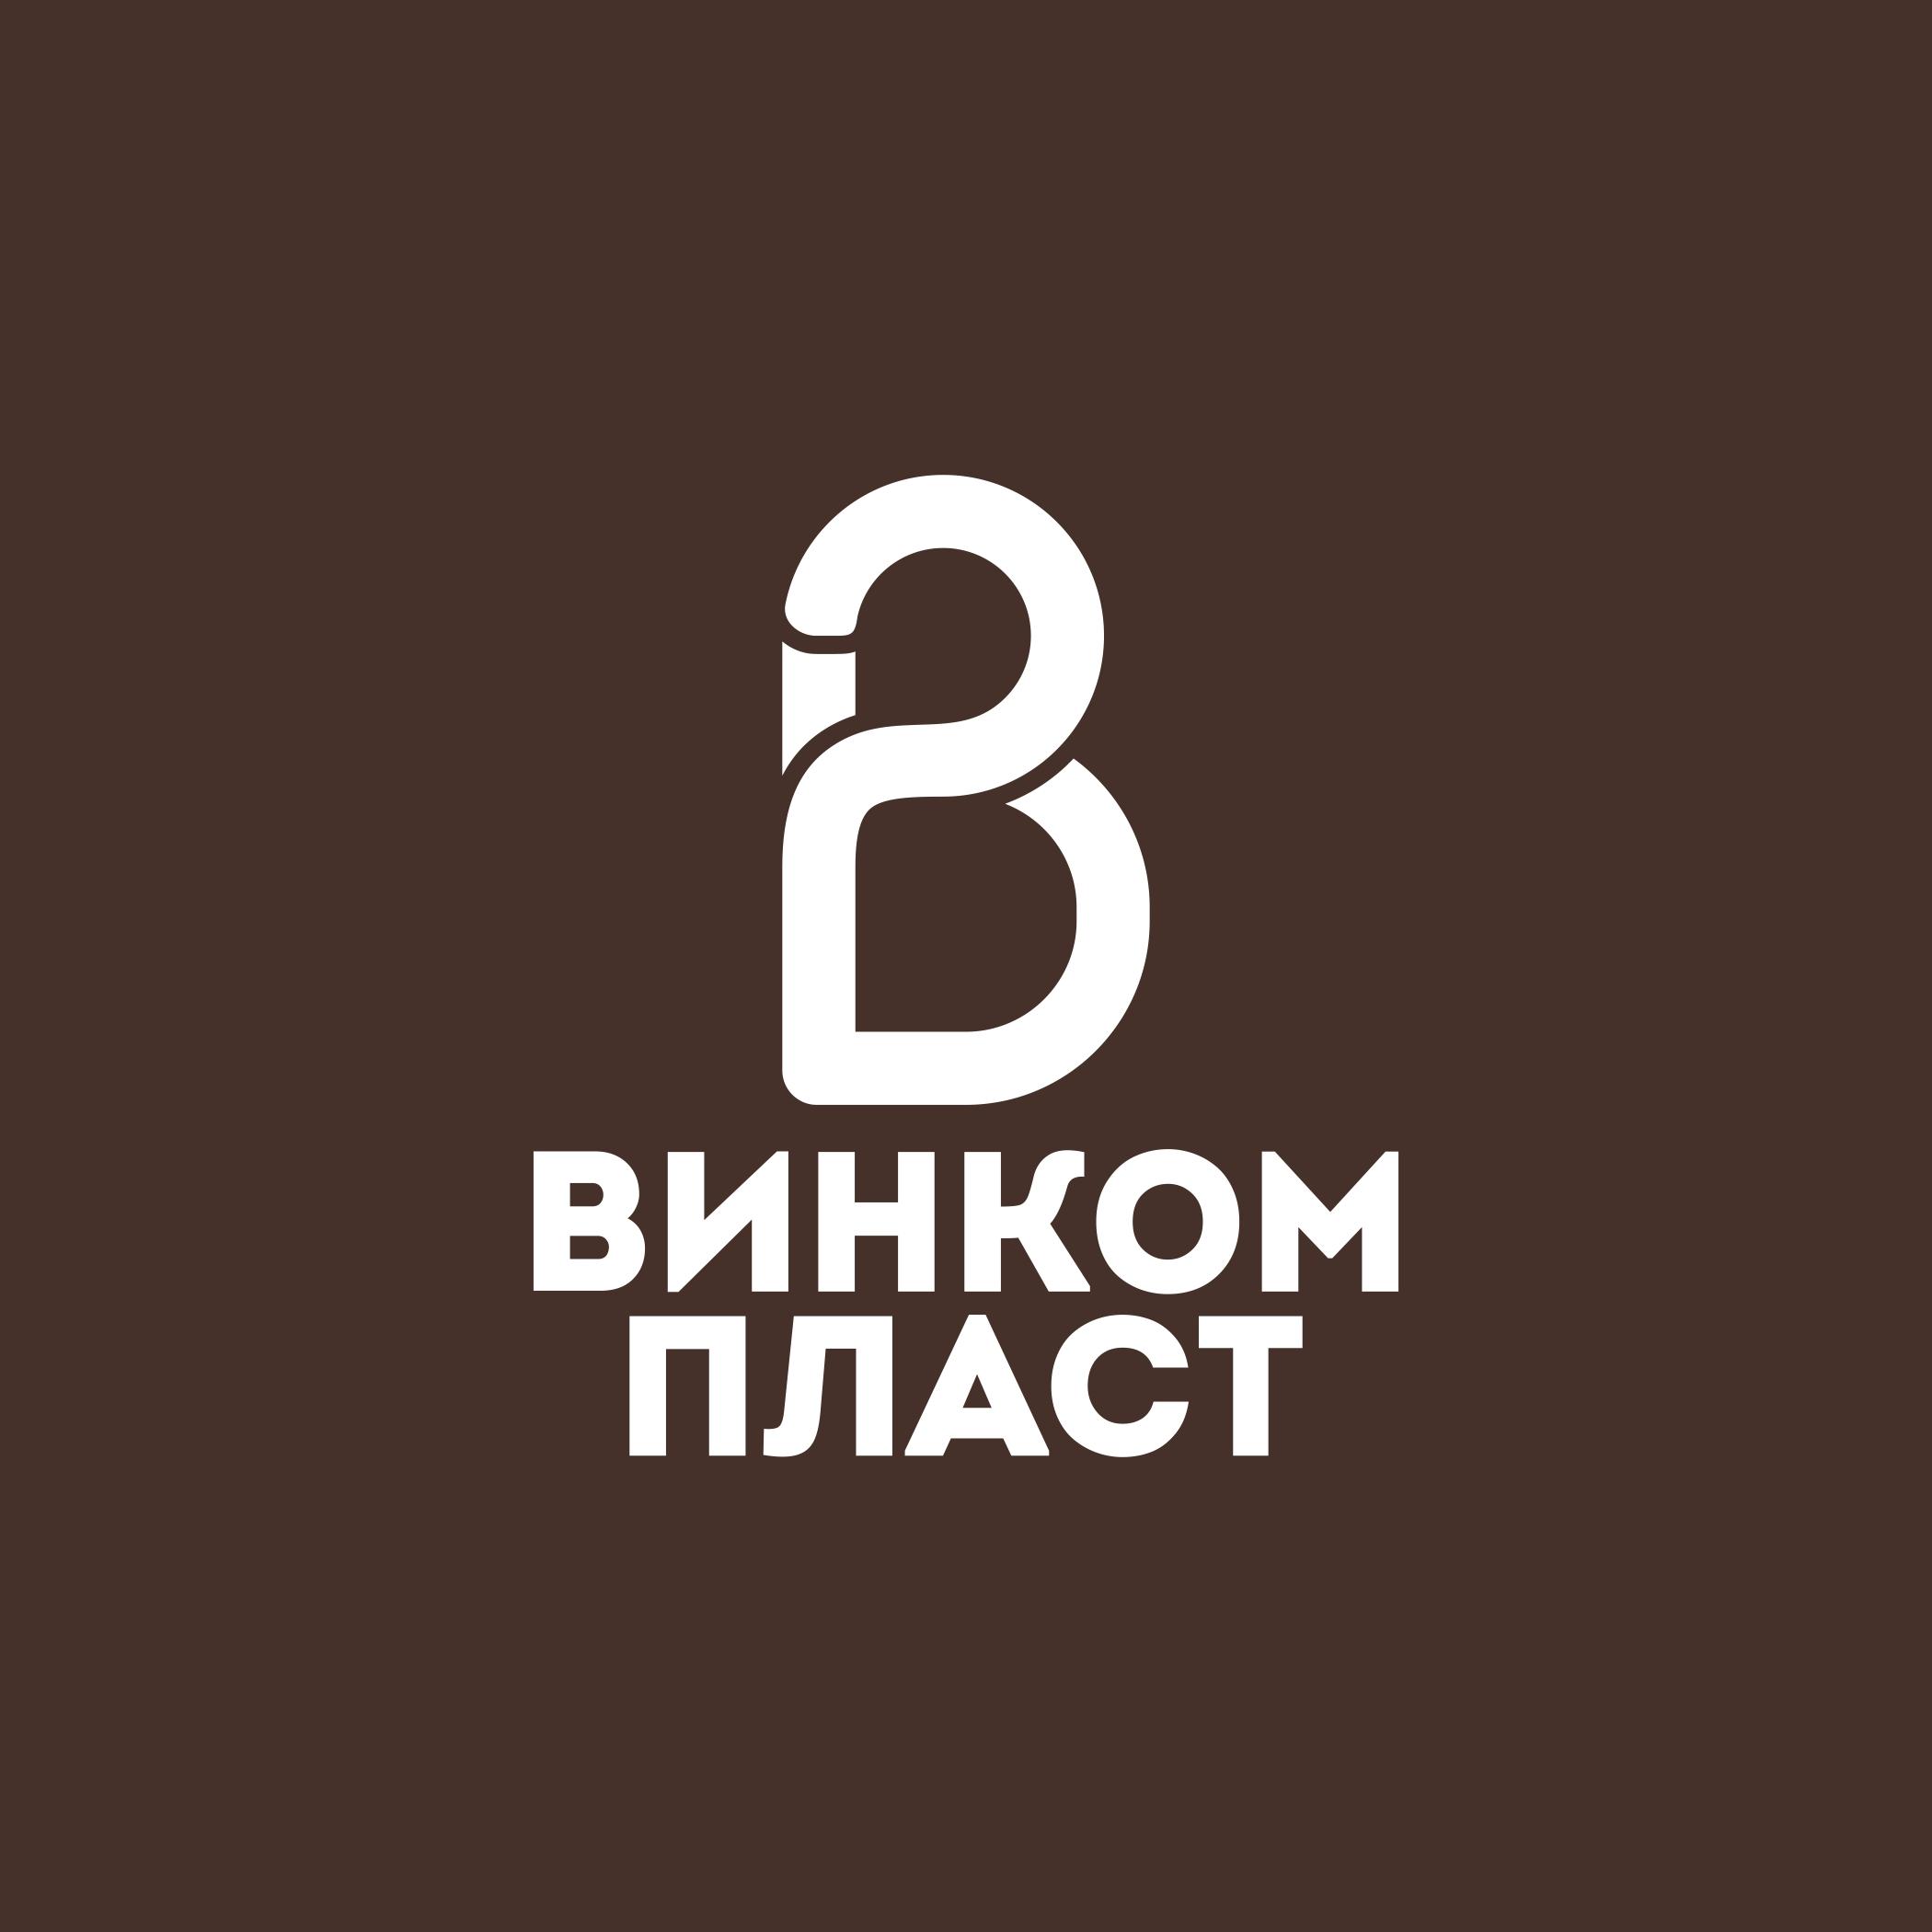 Логотип, фавикон и визитка для компании Винком Пласт  фото f_2265c458ea0b8126.jpg